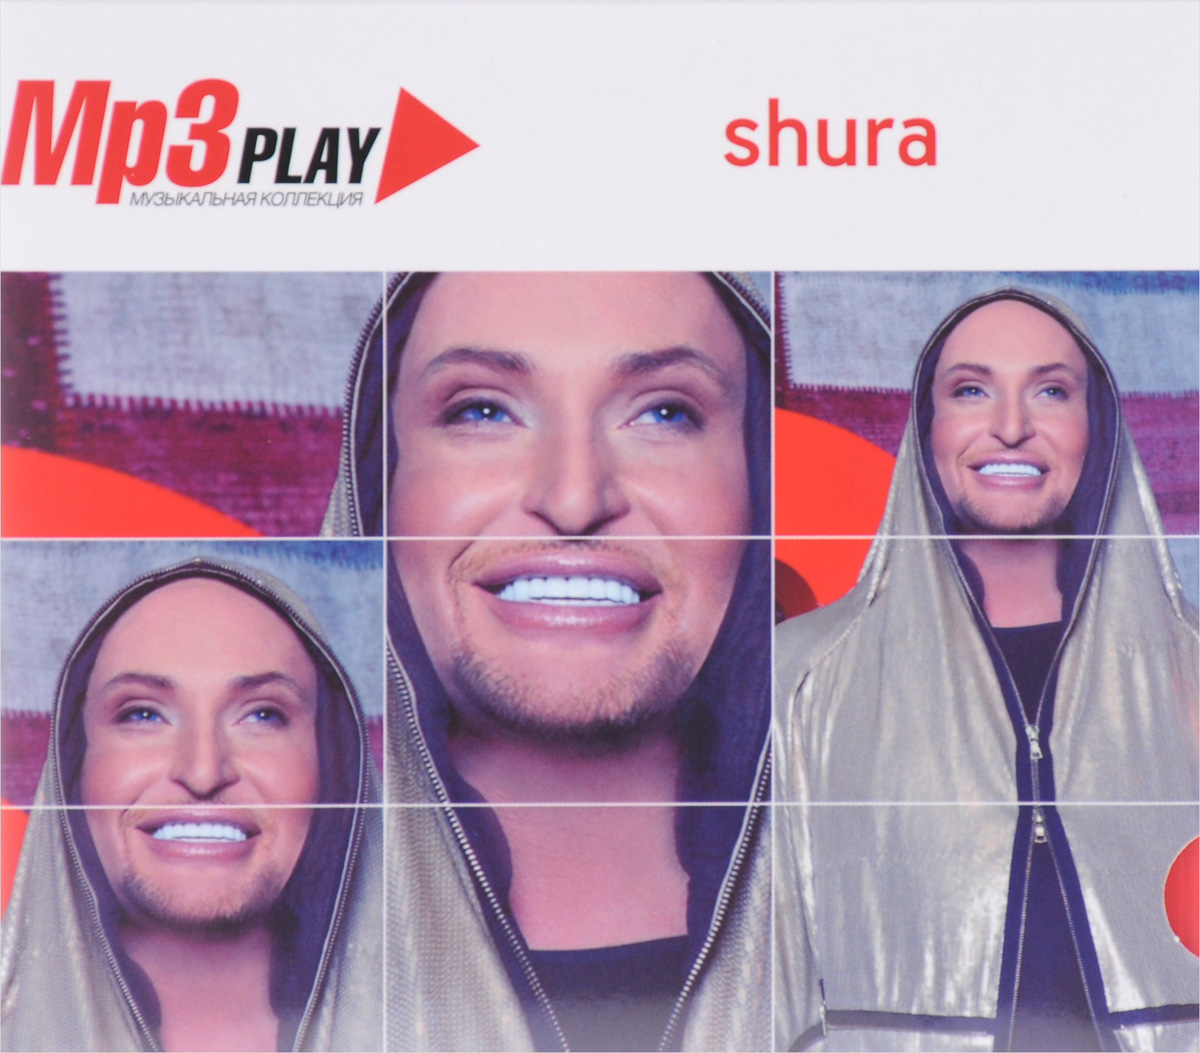 Александр Медведев MP3 Play. Shura (mp3) александр маршал mp3 play cd